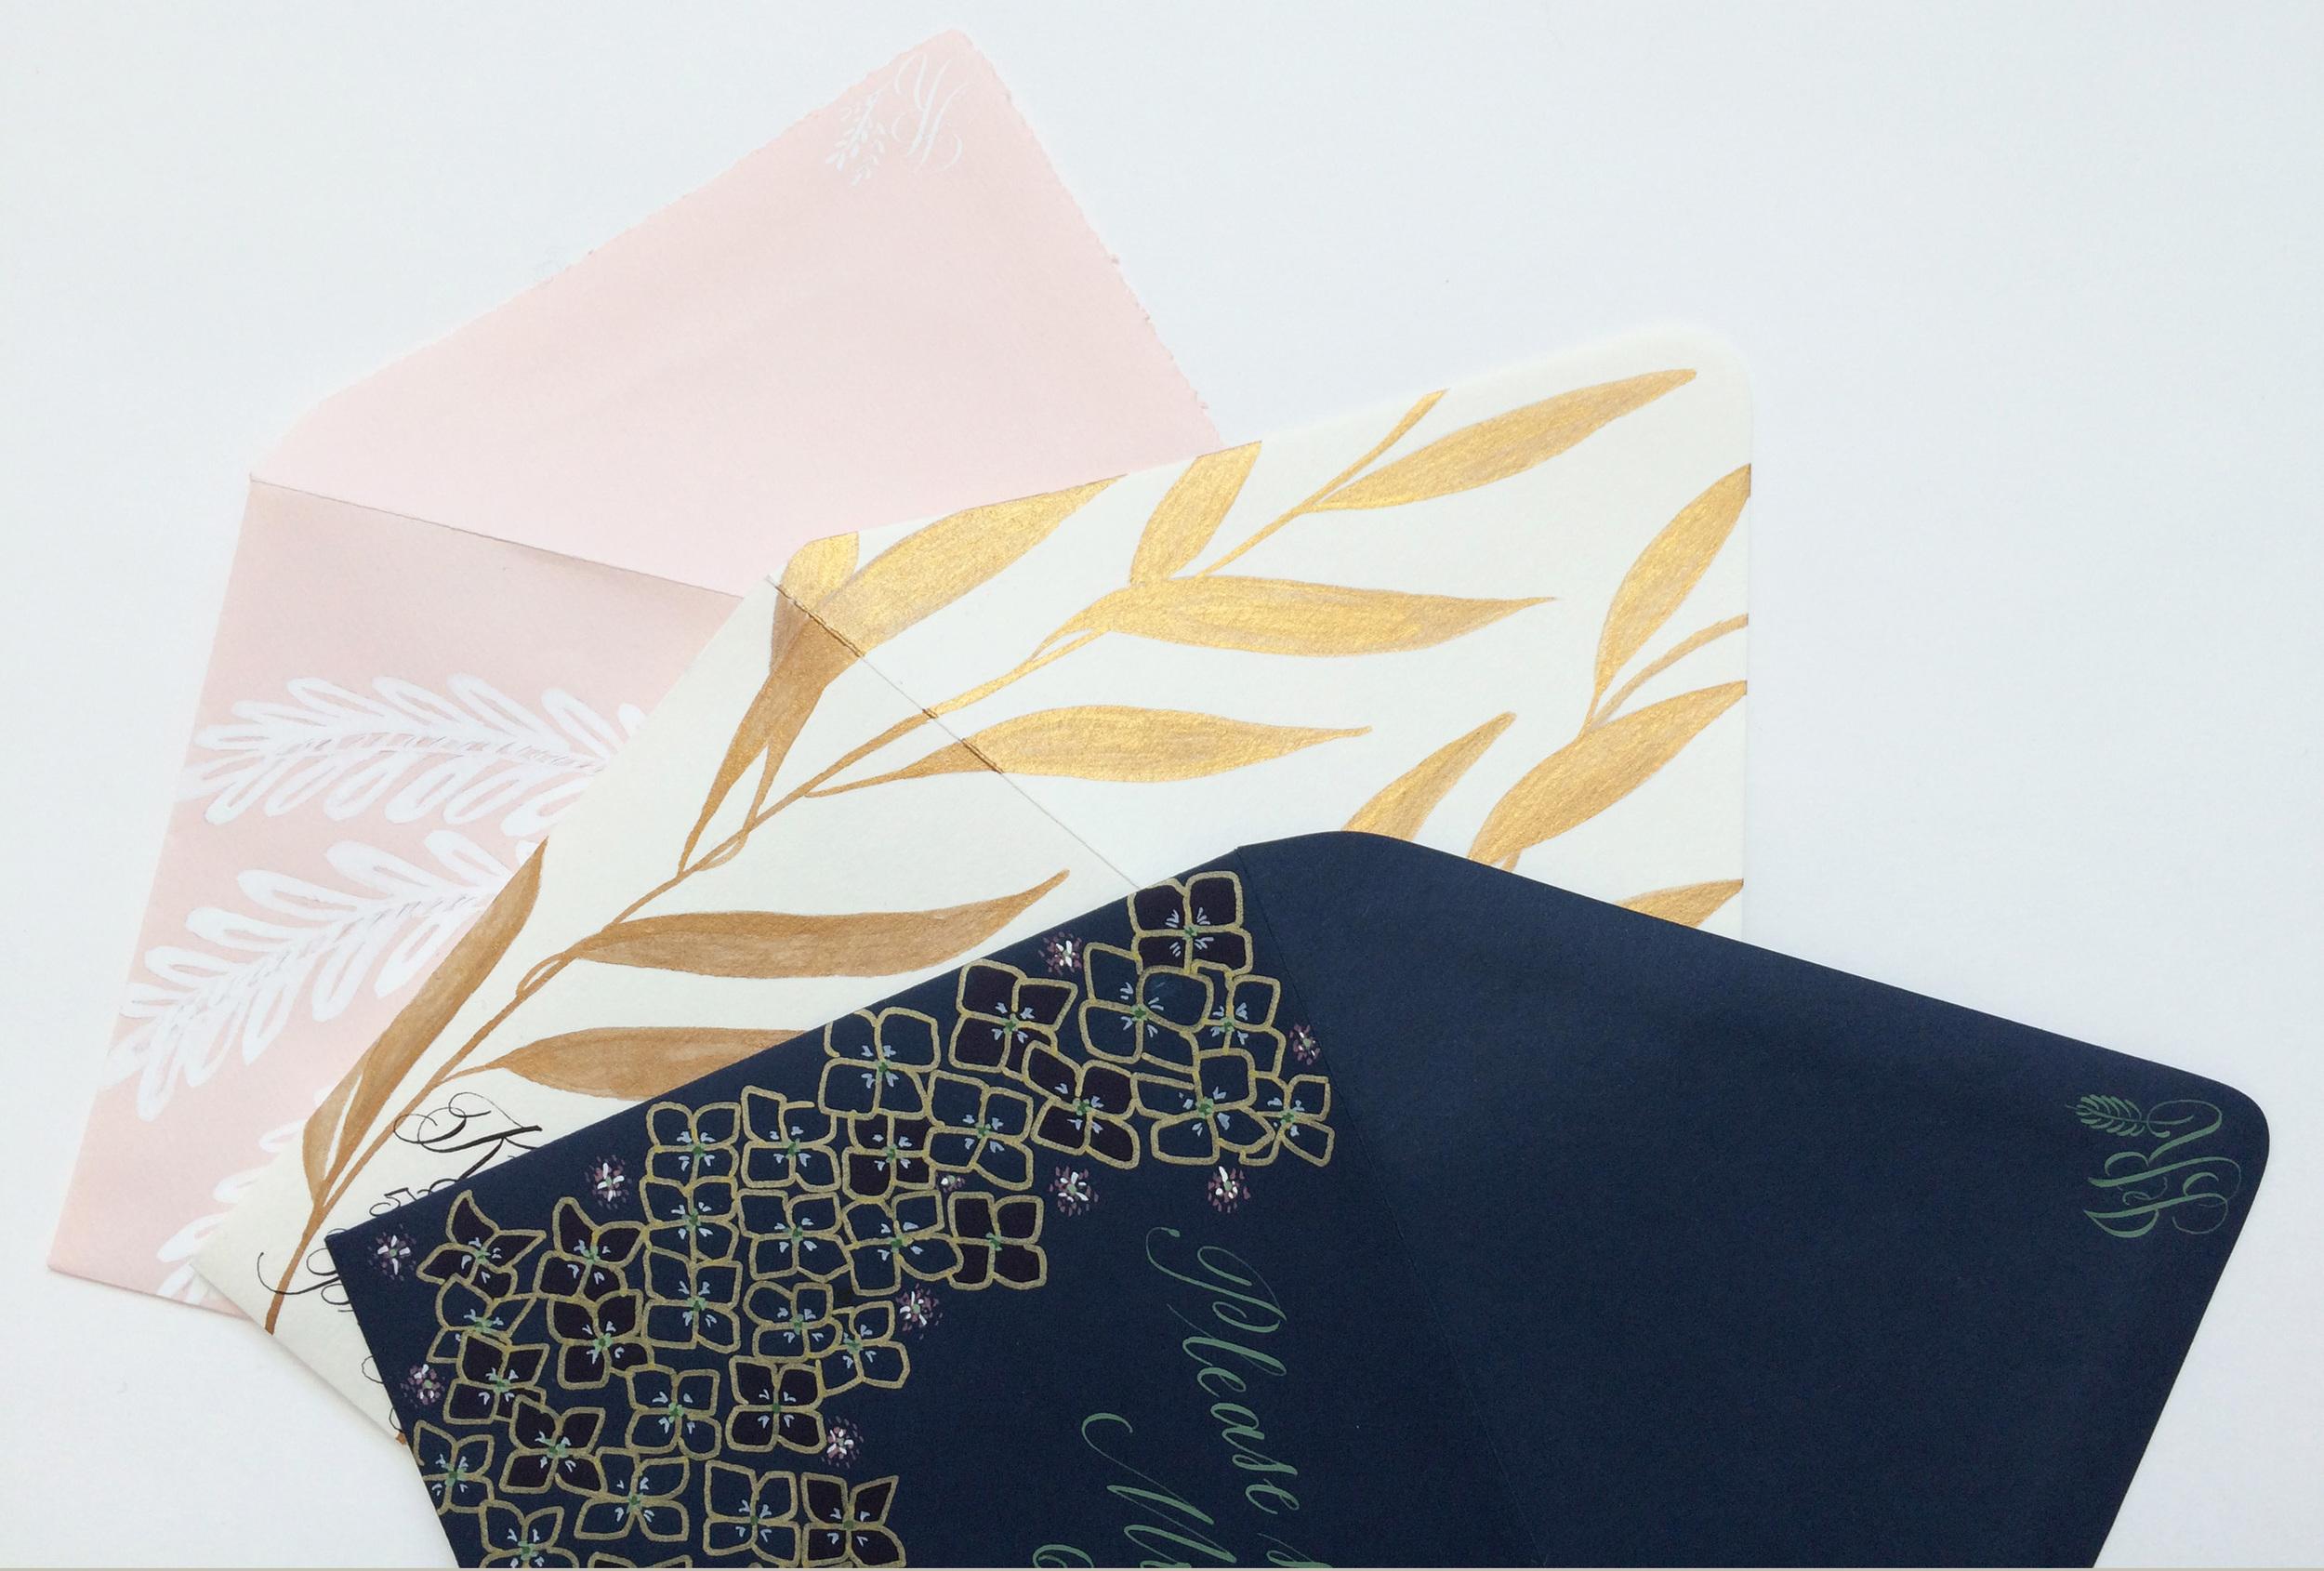 Illustrated envelopes with leaf and floral motifs